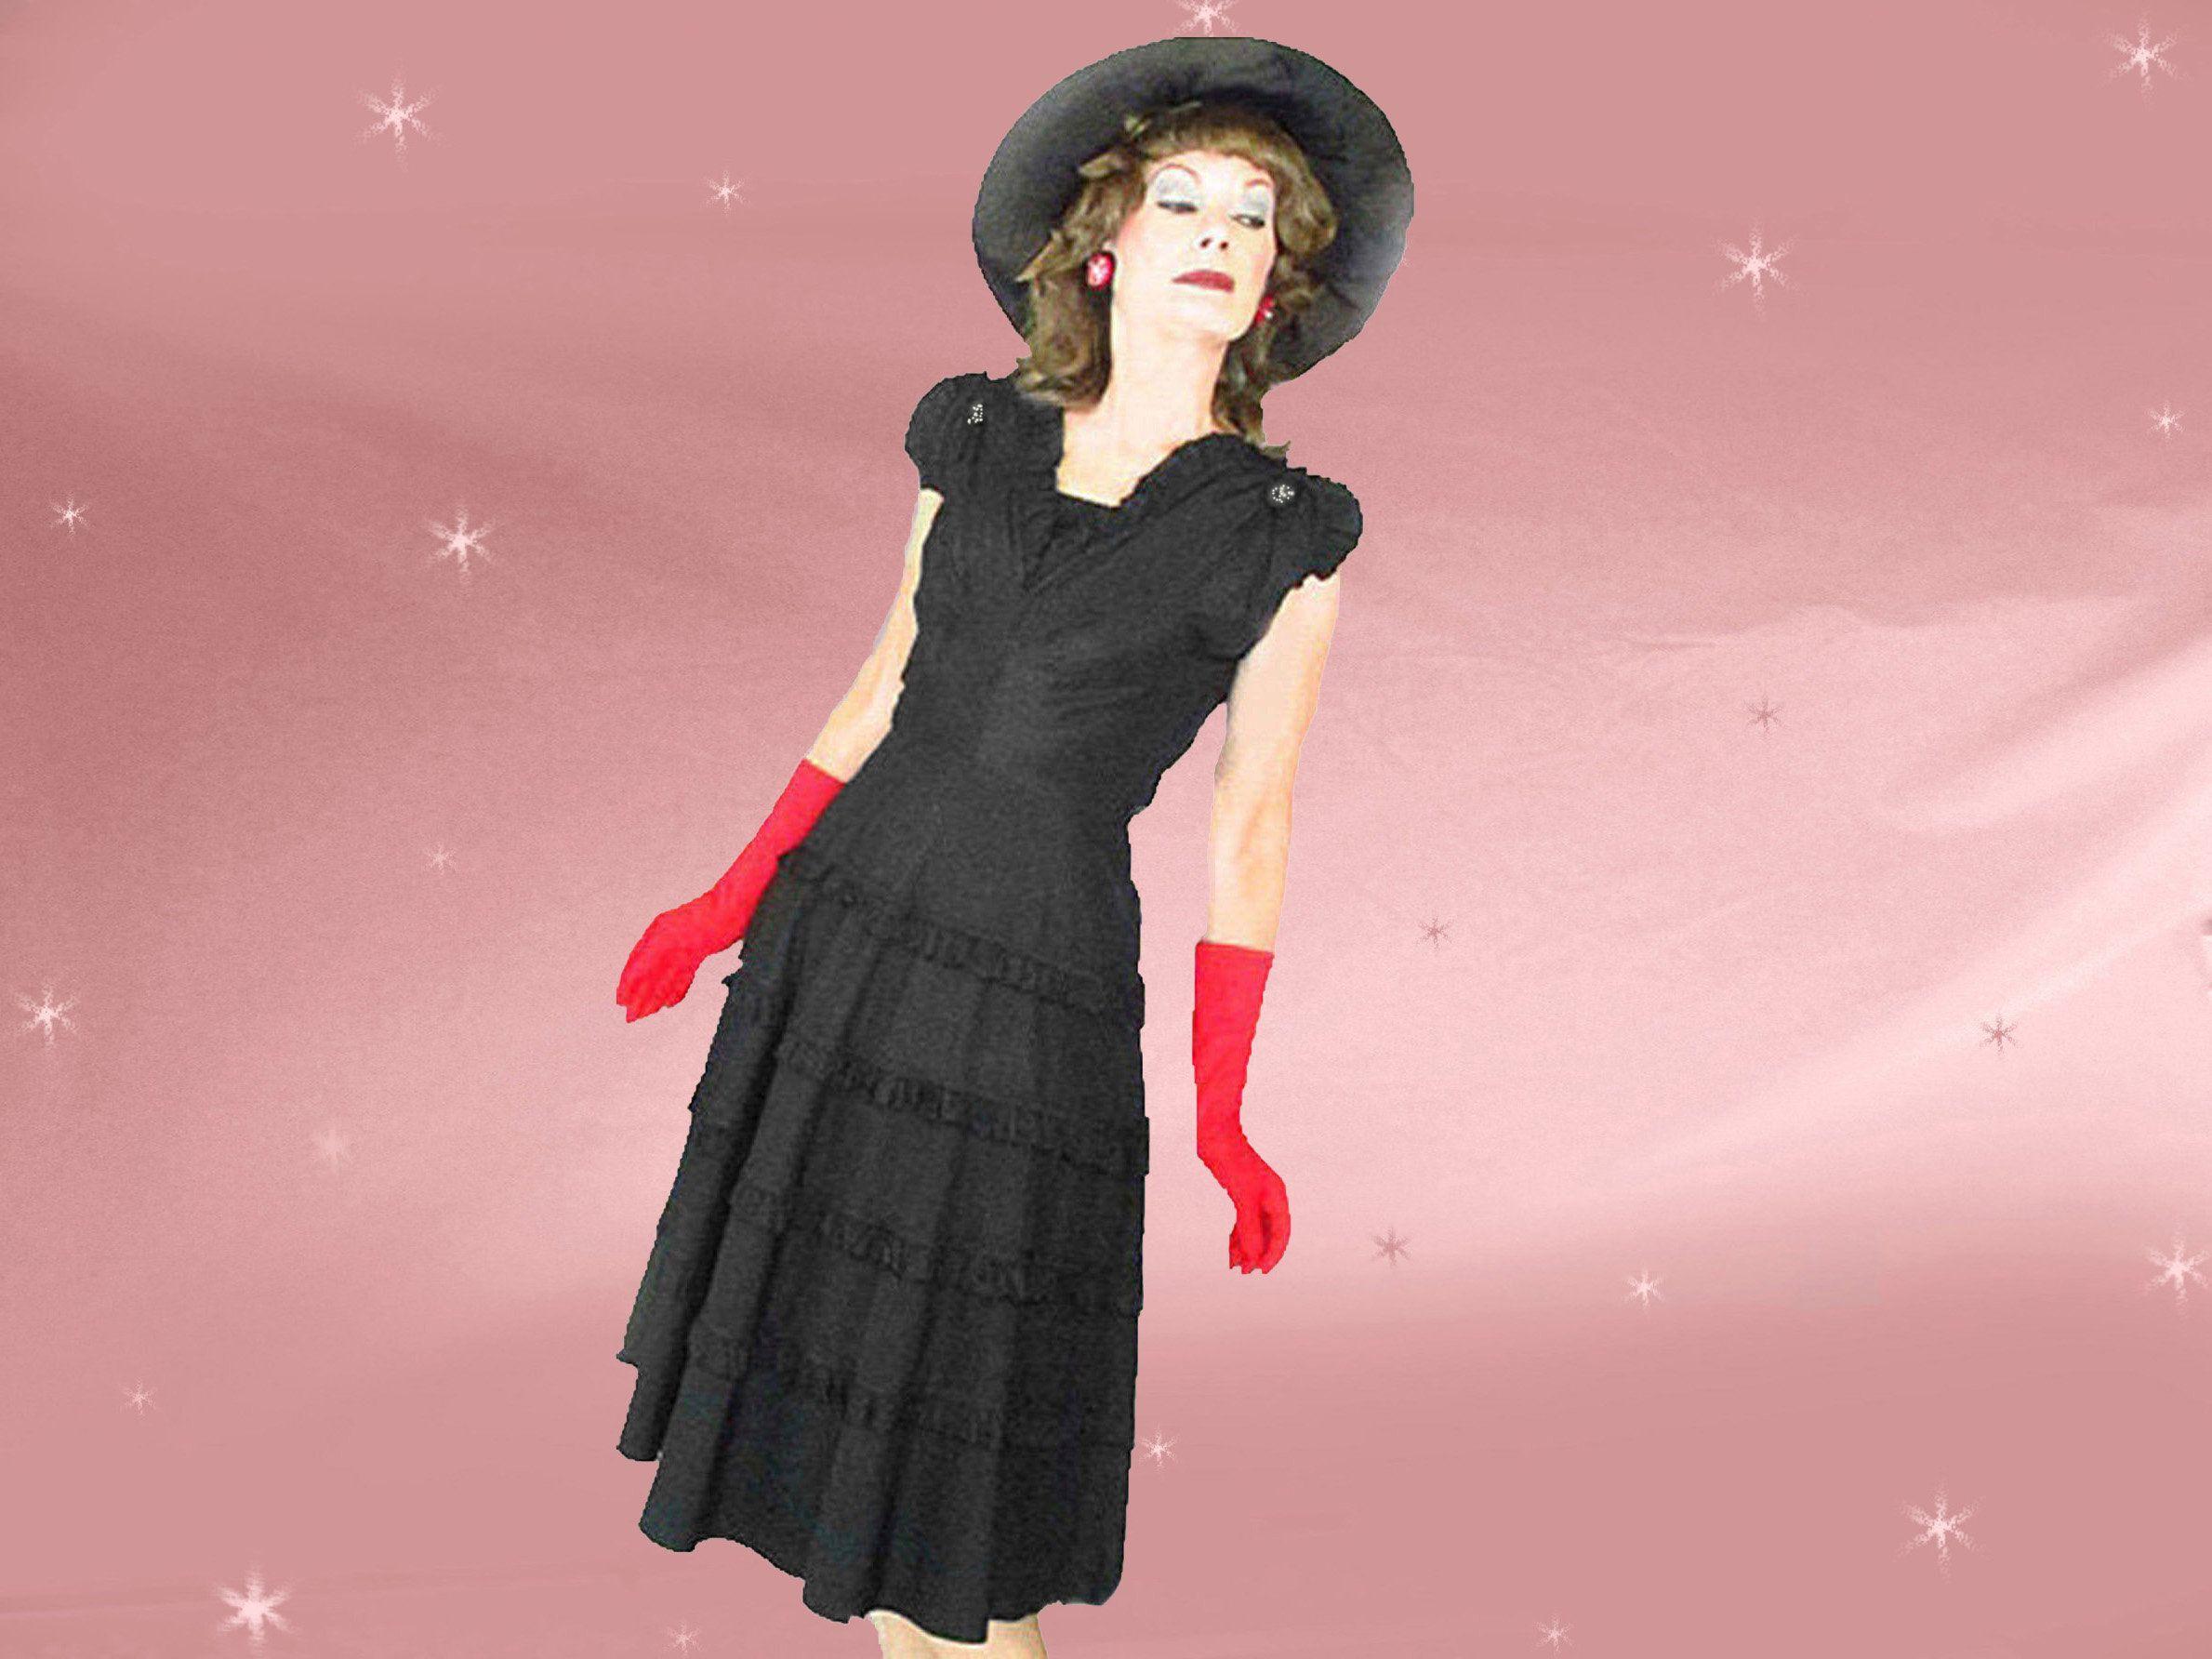 1940s Black Taffeta Dress Large Volup Size Big Skirt 40s Etsy Black Taffeta Dress Taffeta Dress Big Skirts [ 1784 x 2379 Pixel ]